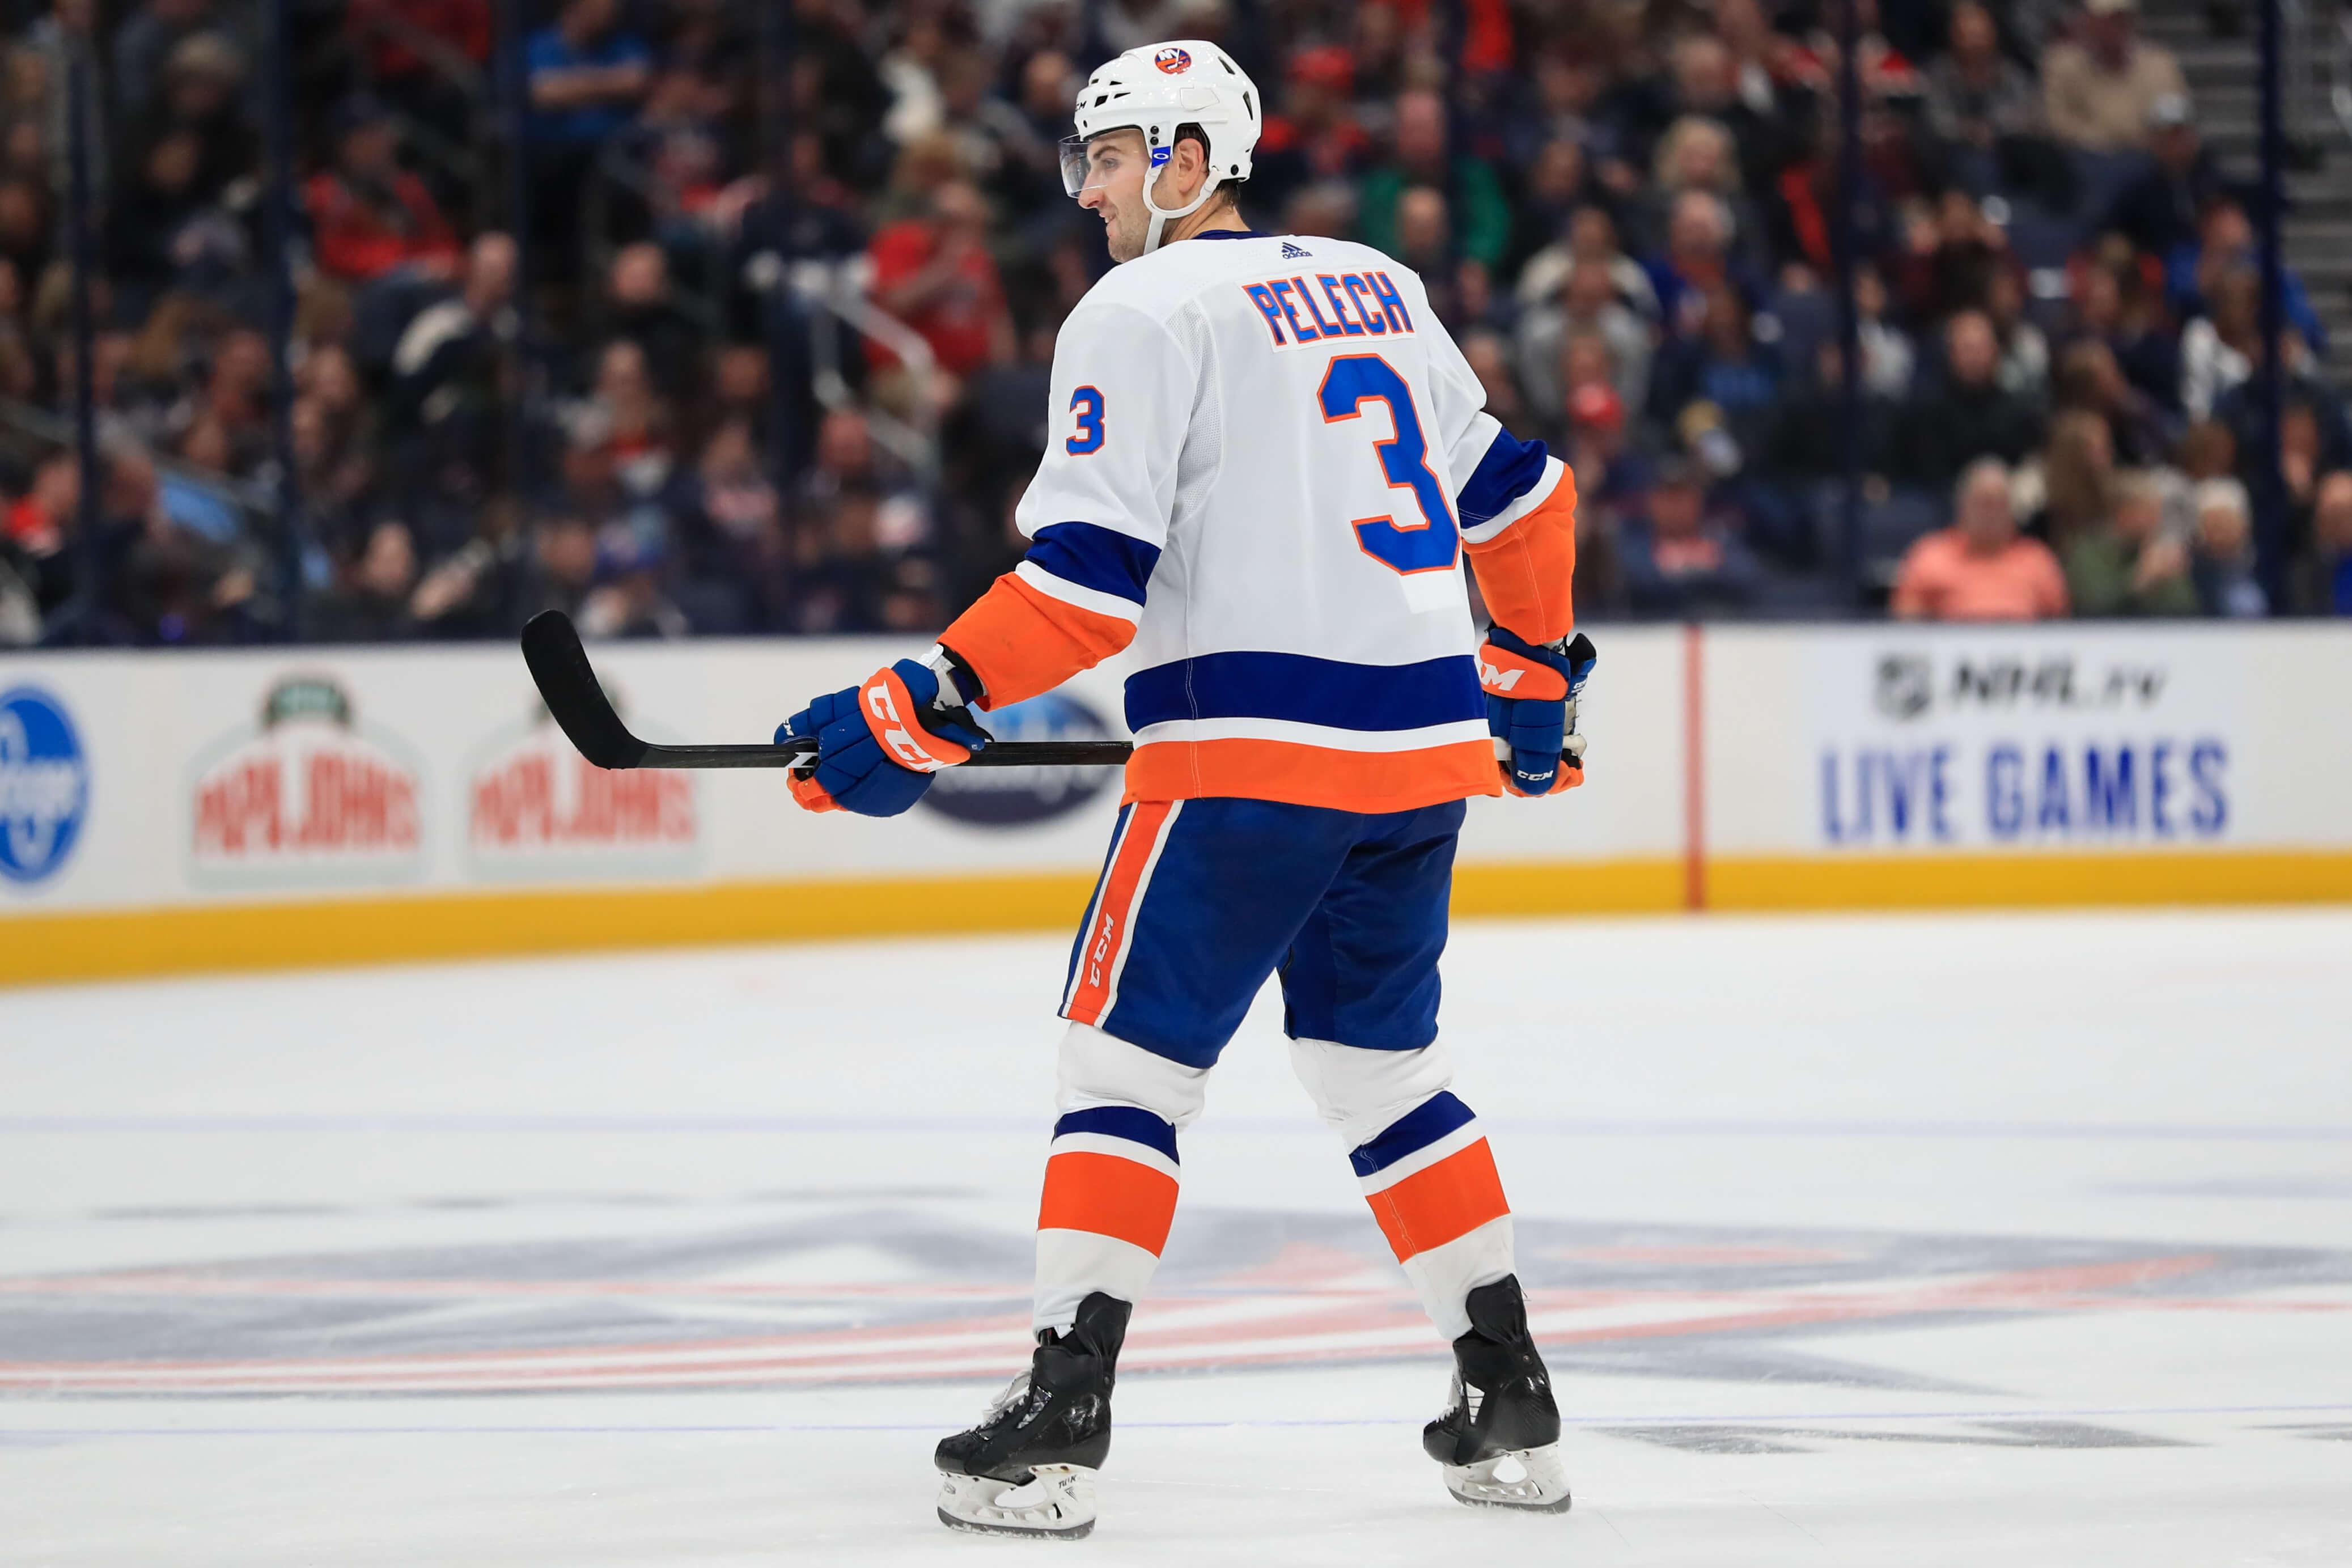 New York Islanders: The Adam Pelech Effect